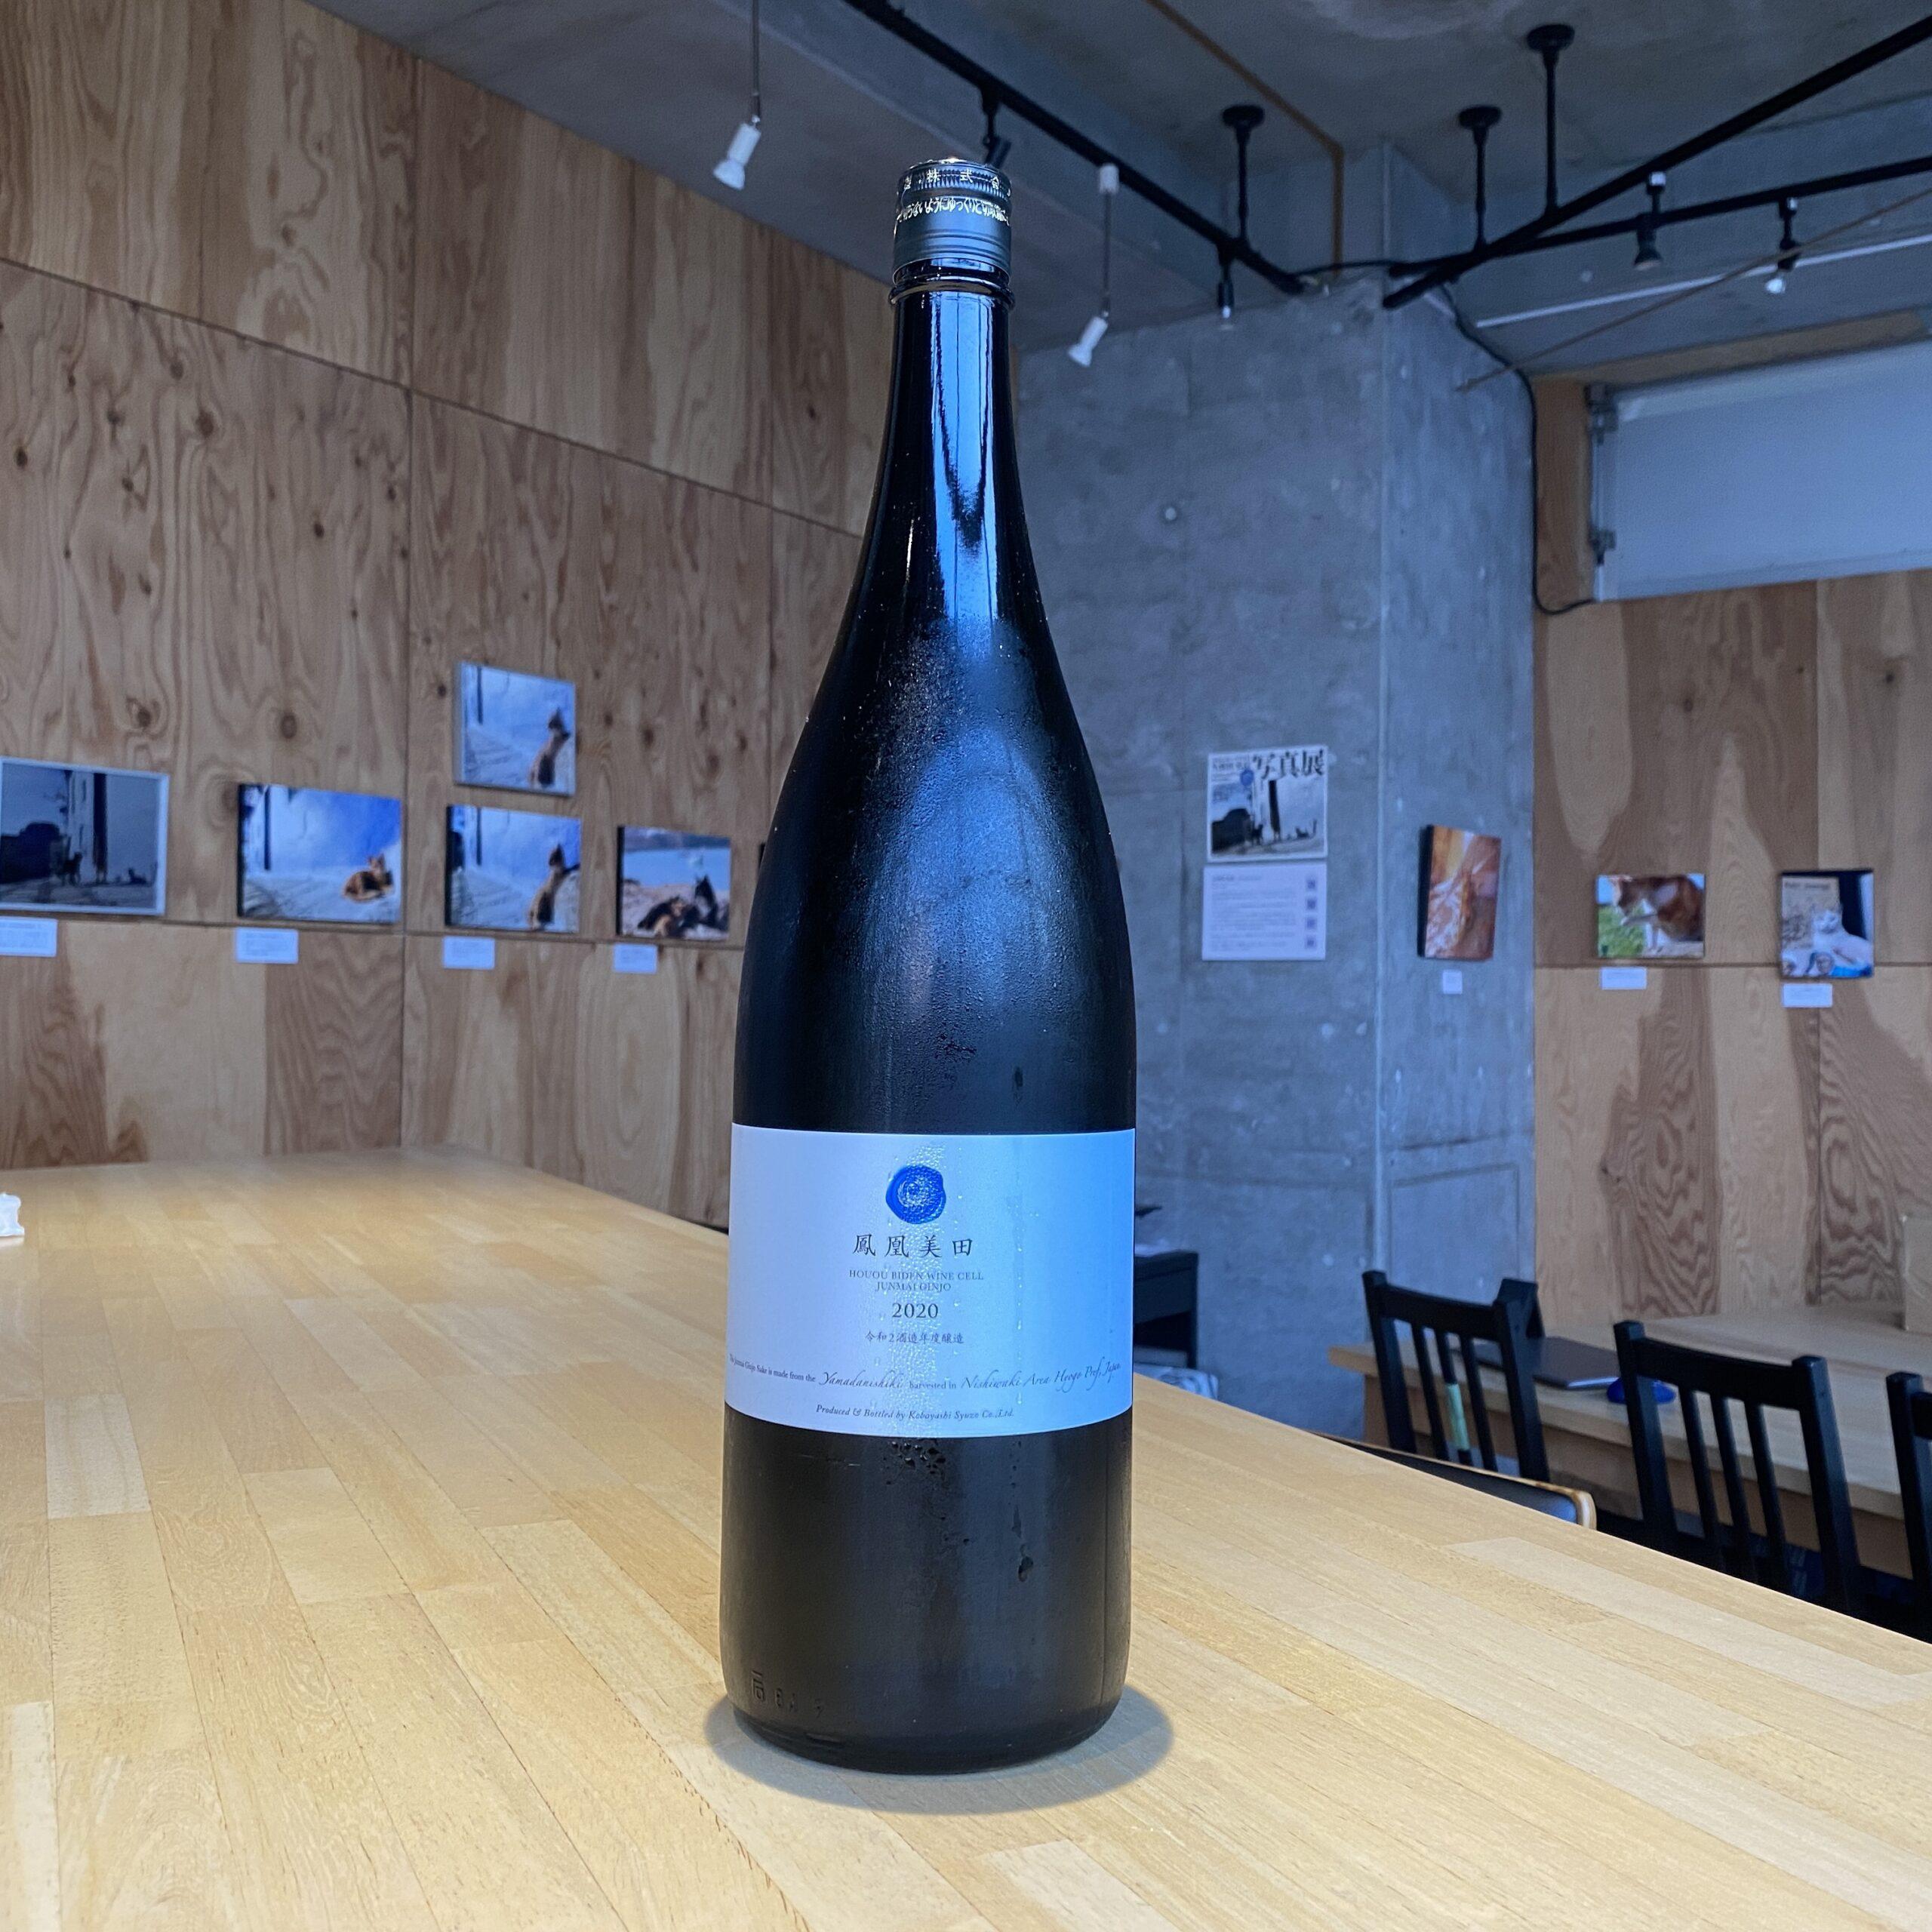 鳳凰美田Wine cell 2020